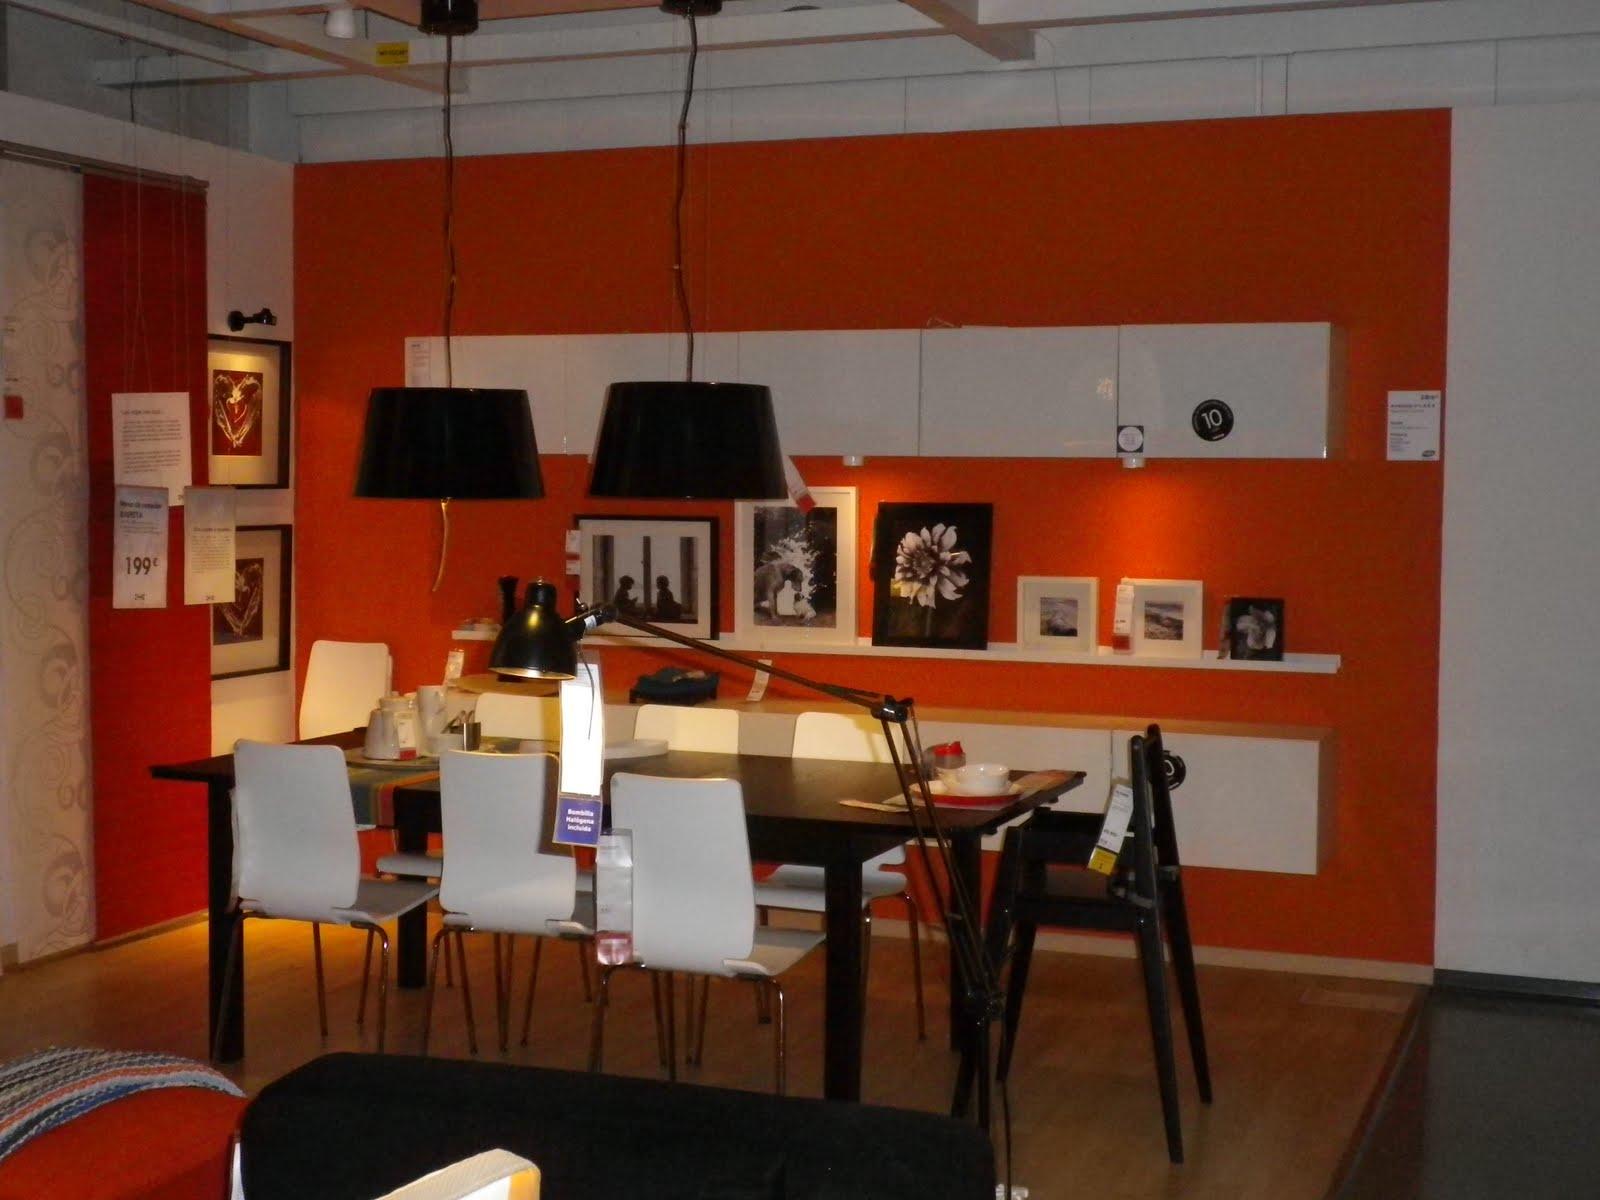 Salones besta de ikea madrid del este i - Ikea muebles salon comedor ...